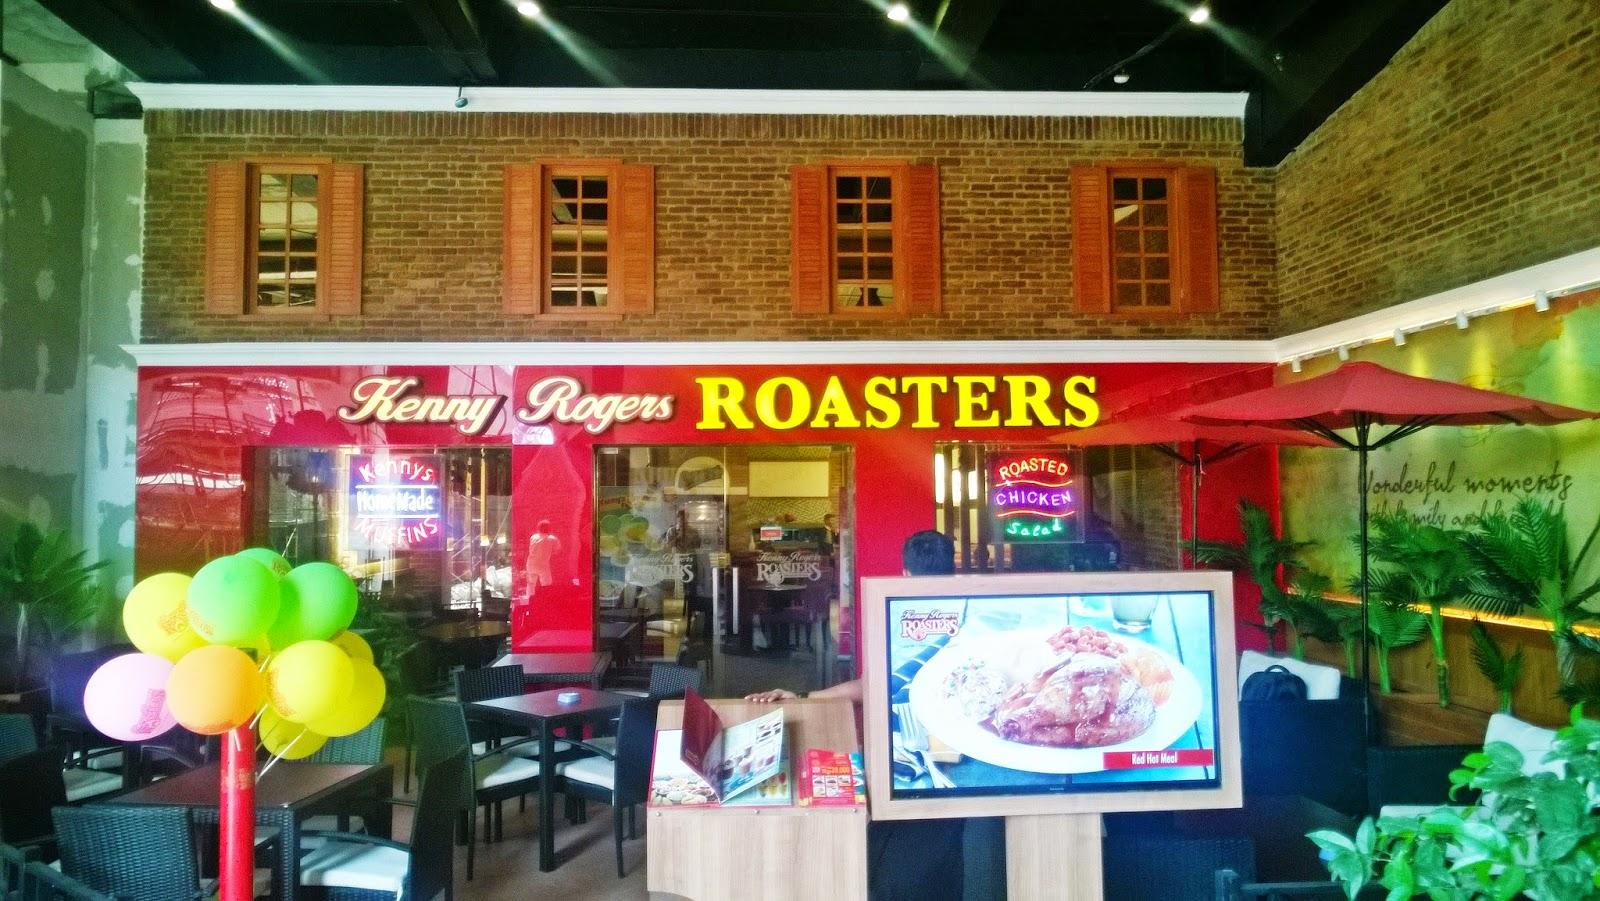 Kenny Rogers ROASTERS: Lezat dan Sehat